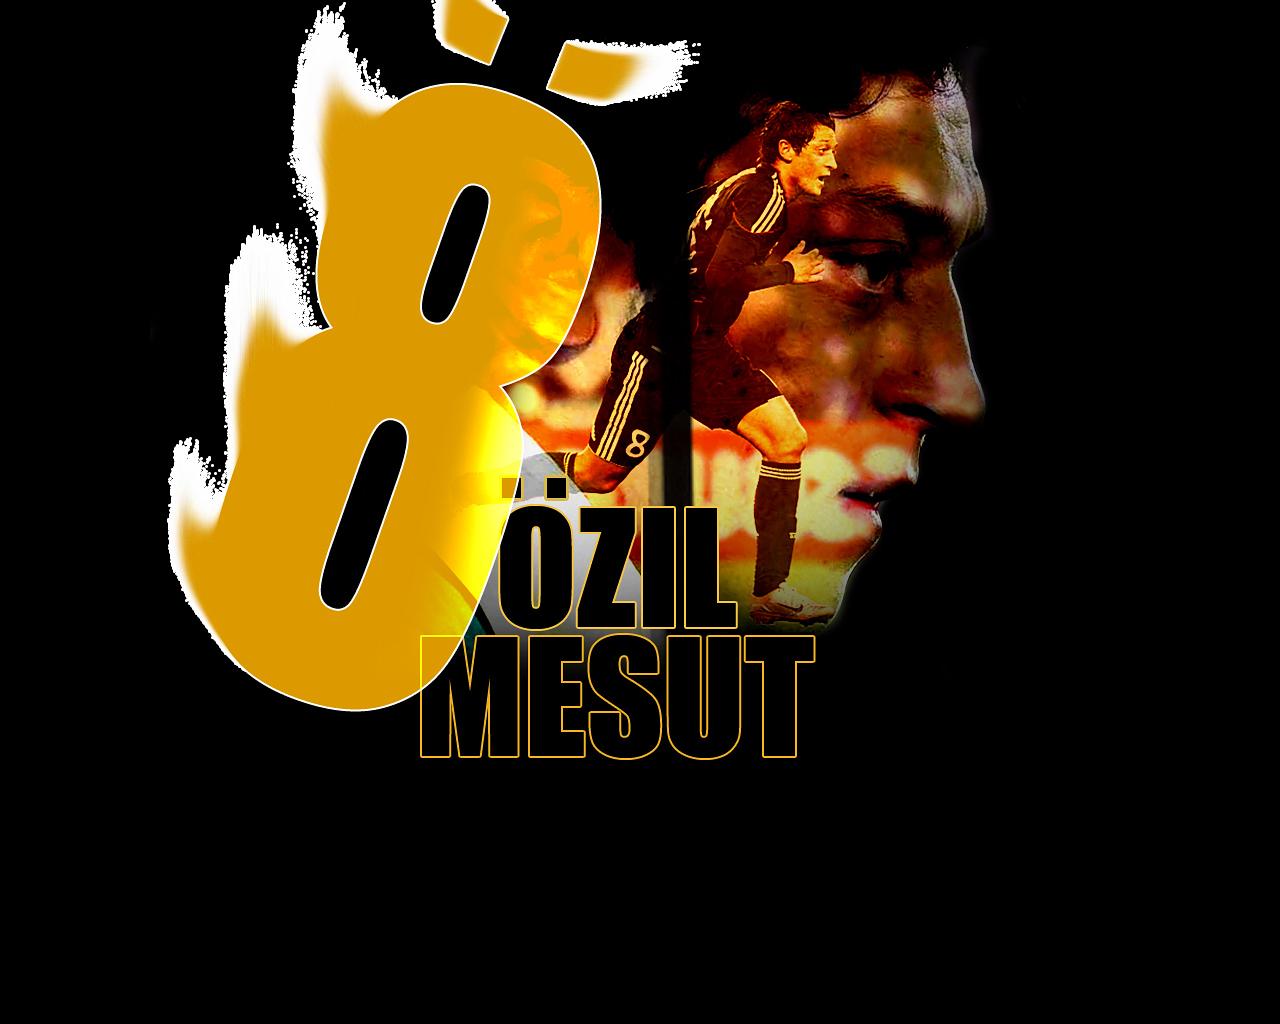 http://2.bp.blogspot.com/-57DUrgnmKfE/UImPNMr1BaI/AAAAAAAAGRQ/AR583Sy2D1w/s1600/Mesut+Ozil+Hd+Wallpapers+2012-2013+02.jpg